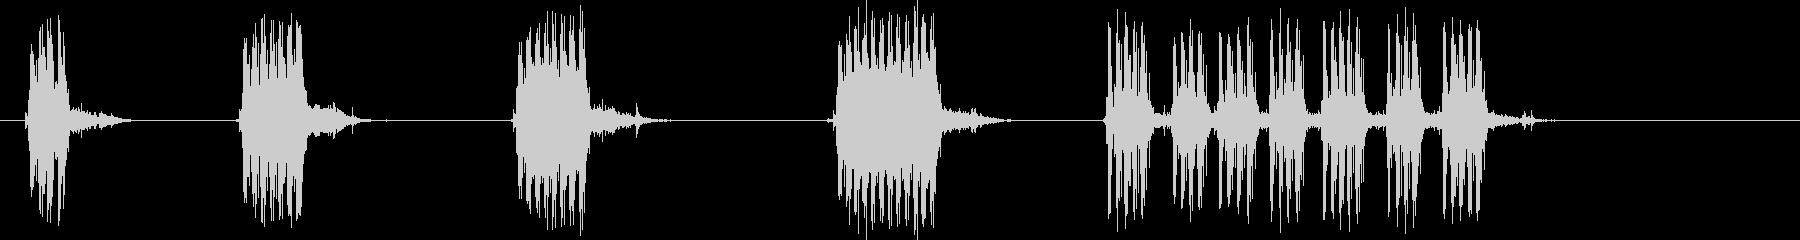 M-60自動:複数のバースト。各バ...の未再生の波形